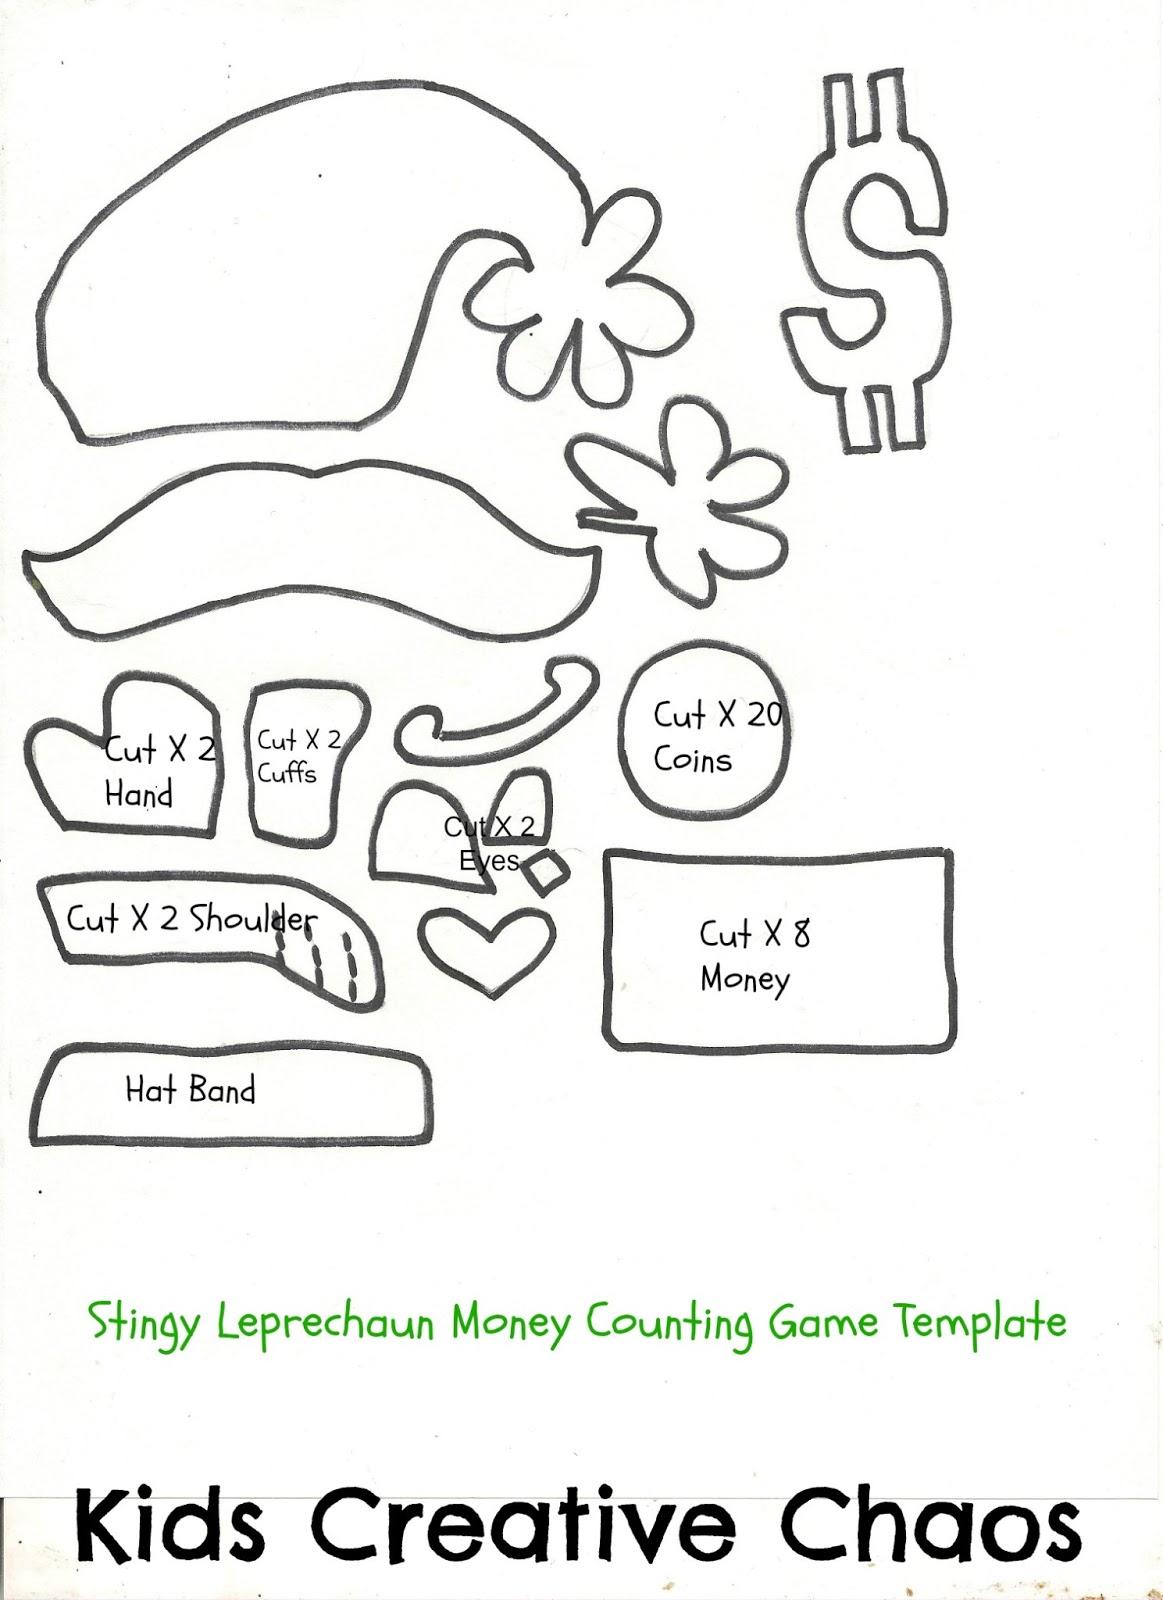 Saint Patrick's Day Math Game The Stingy Leprechaun